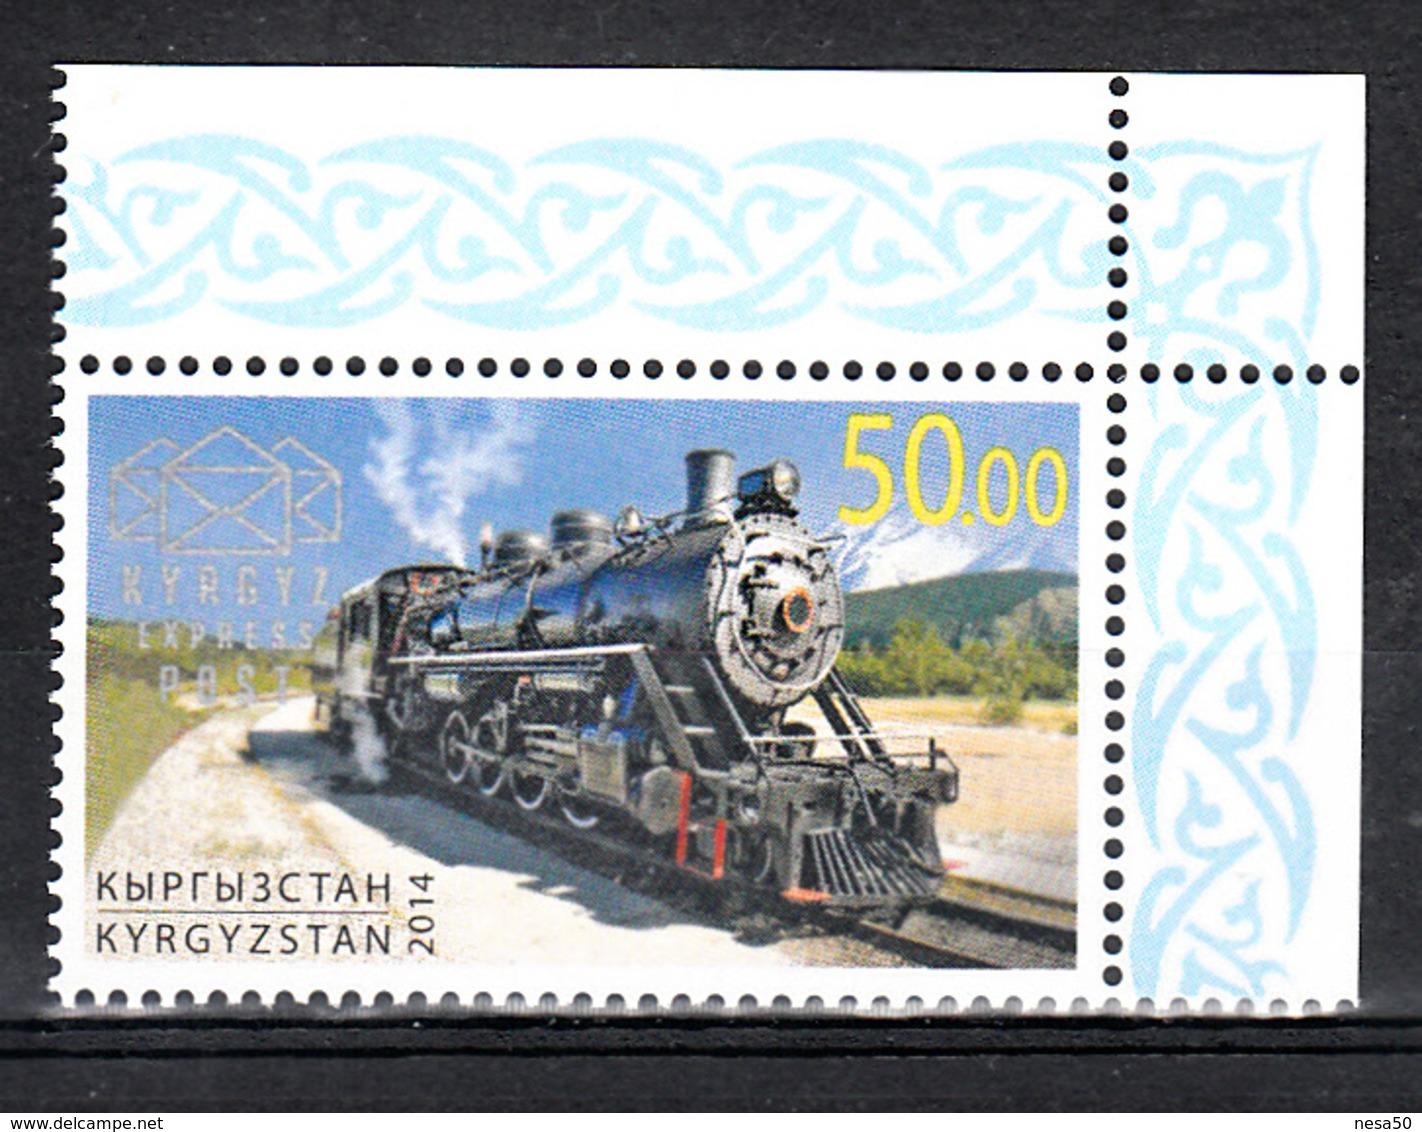 Trein, Trains, Railway, Locomotive: Kyrgyzstan 2014 Old Loc, Zegel Uit Blok, Postfris - Trains